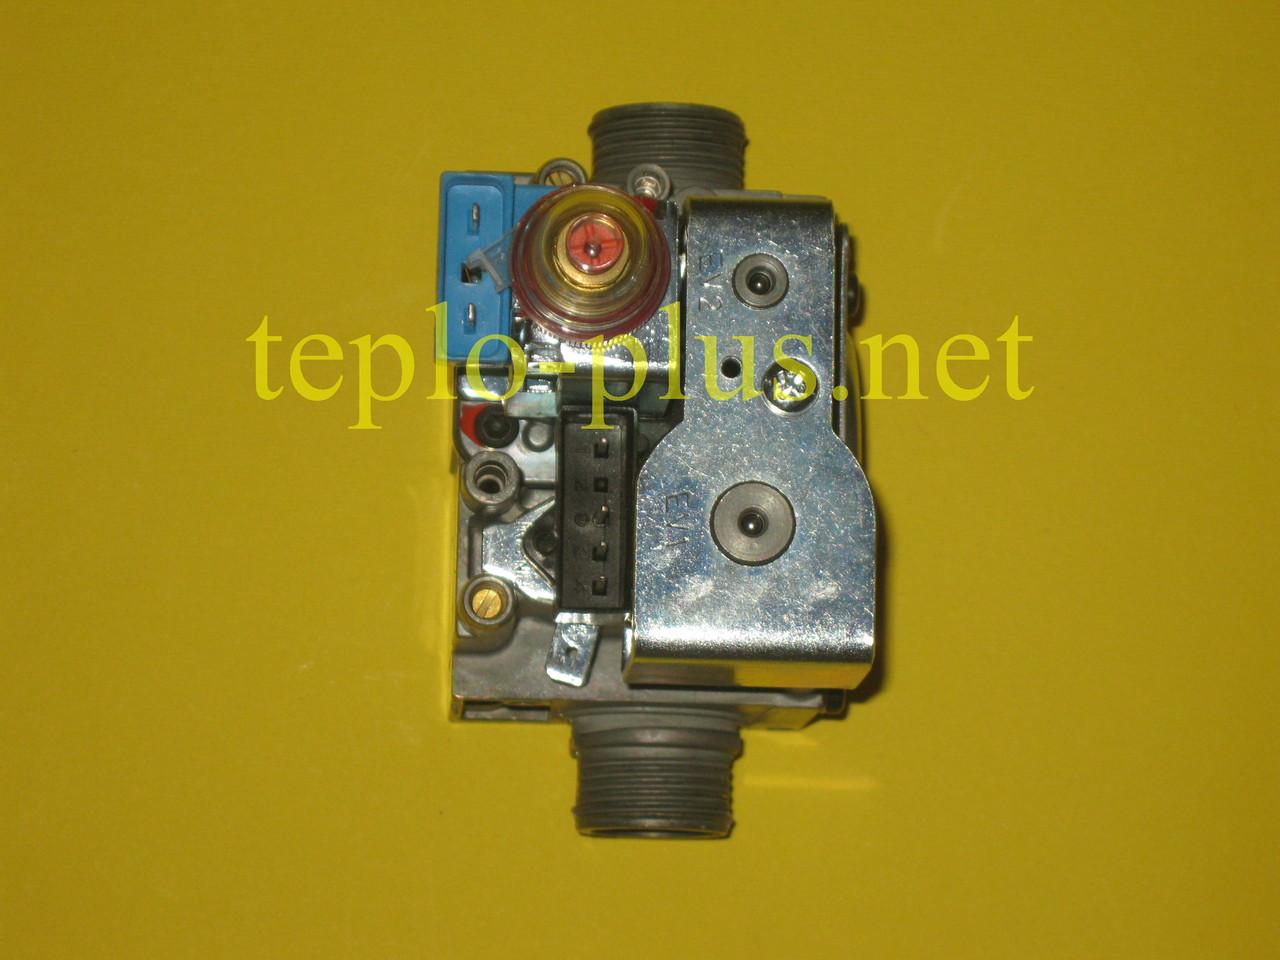 Газовий клапан R10021021 (10021021) Beretta Ciao, Ciao N, City, Exclusive Mix, Mynute DGT, Super Exclusive